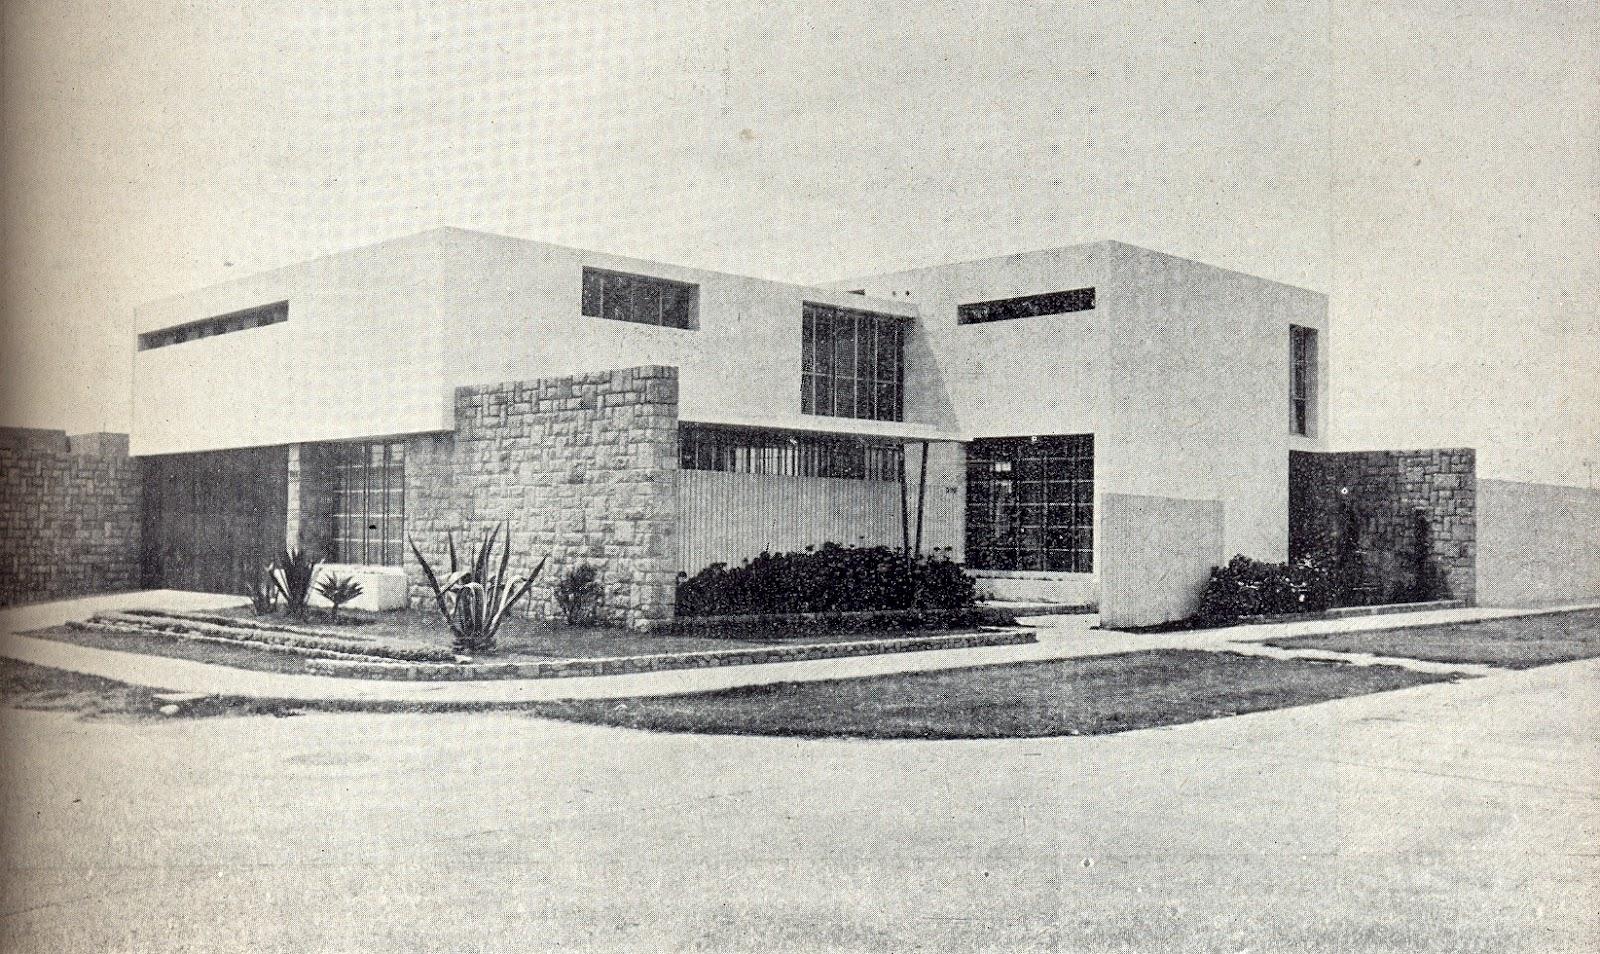 La forma moderna en latinoam rica arquitectura moderna en for Departamentos arquitectura moderna